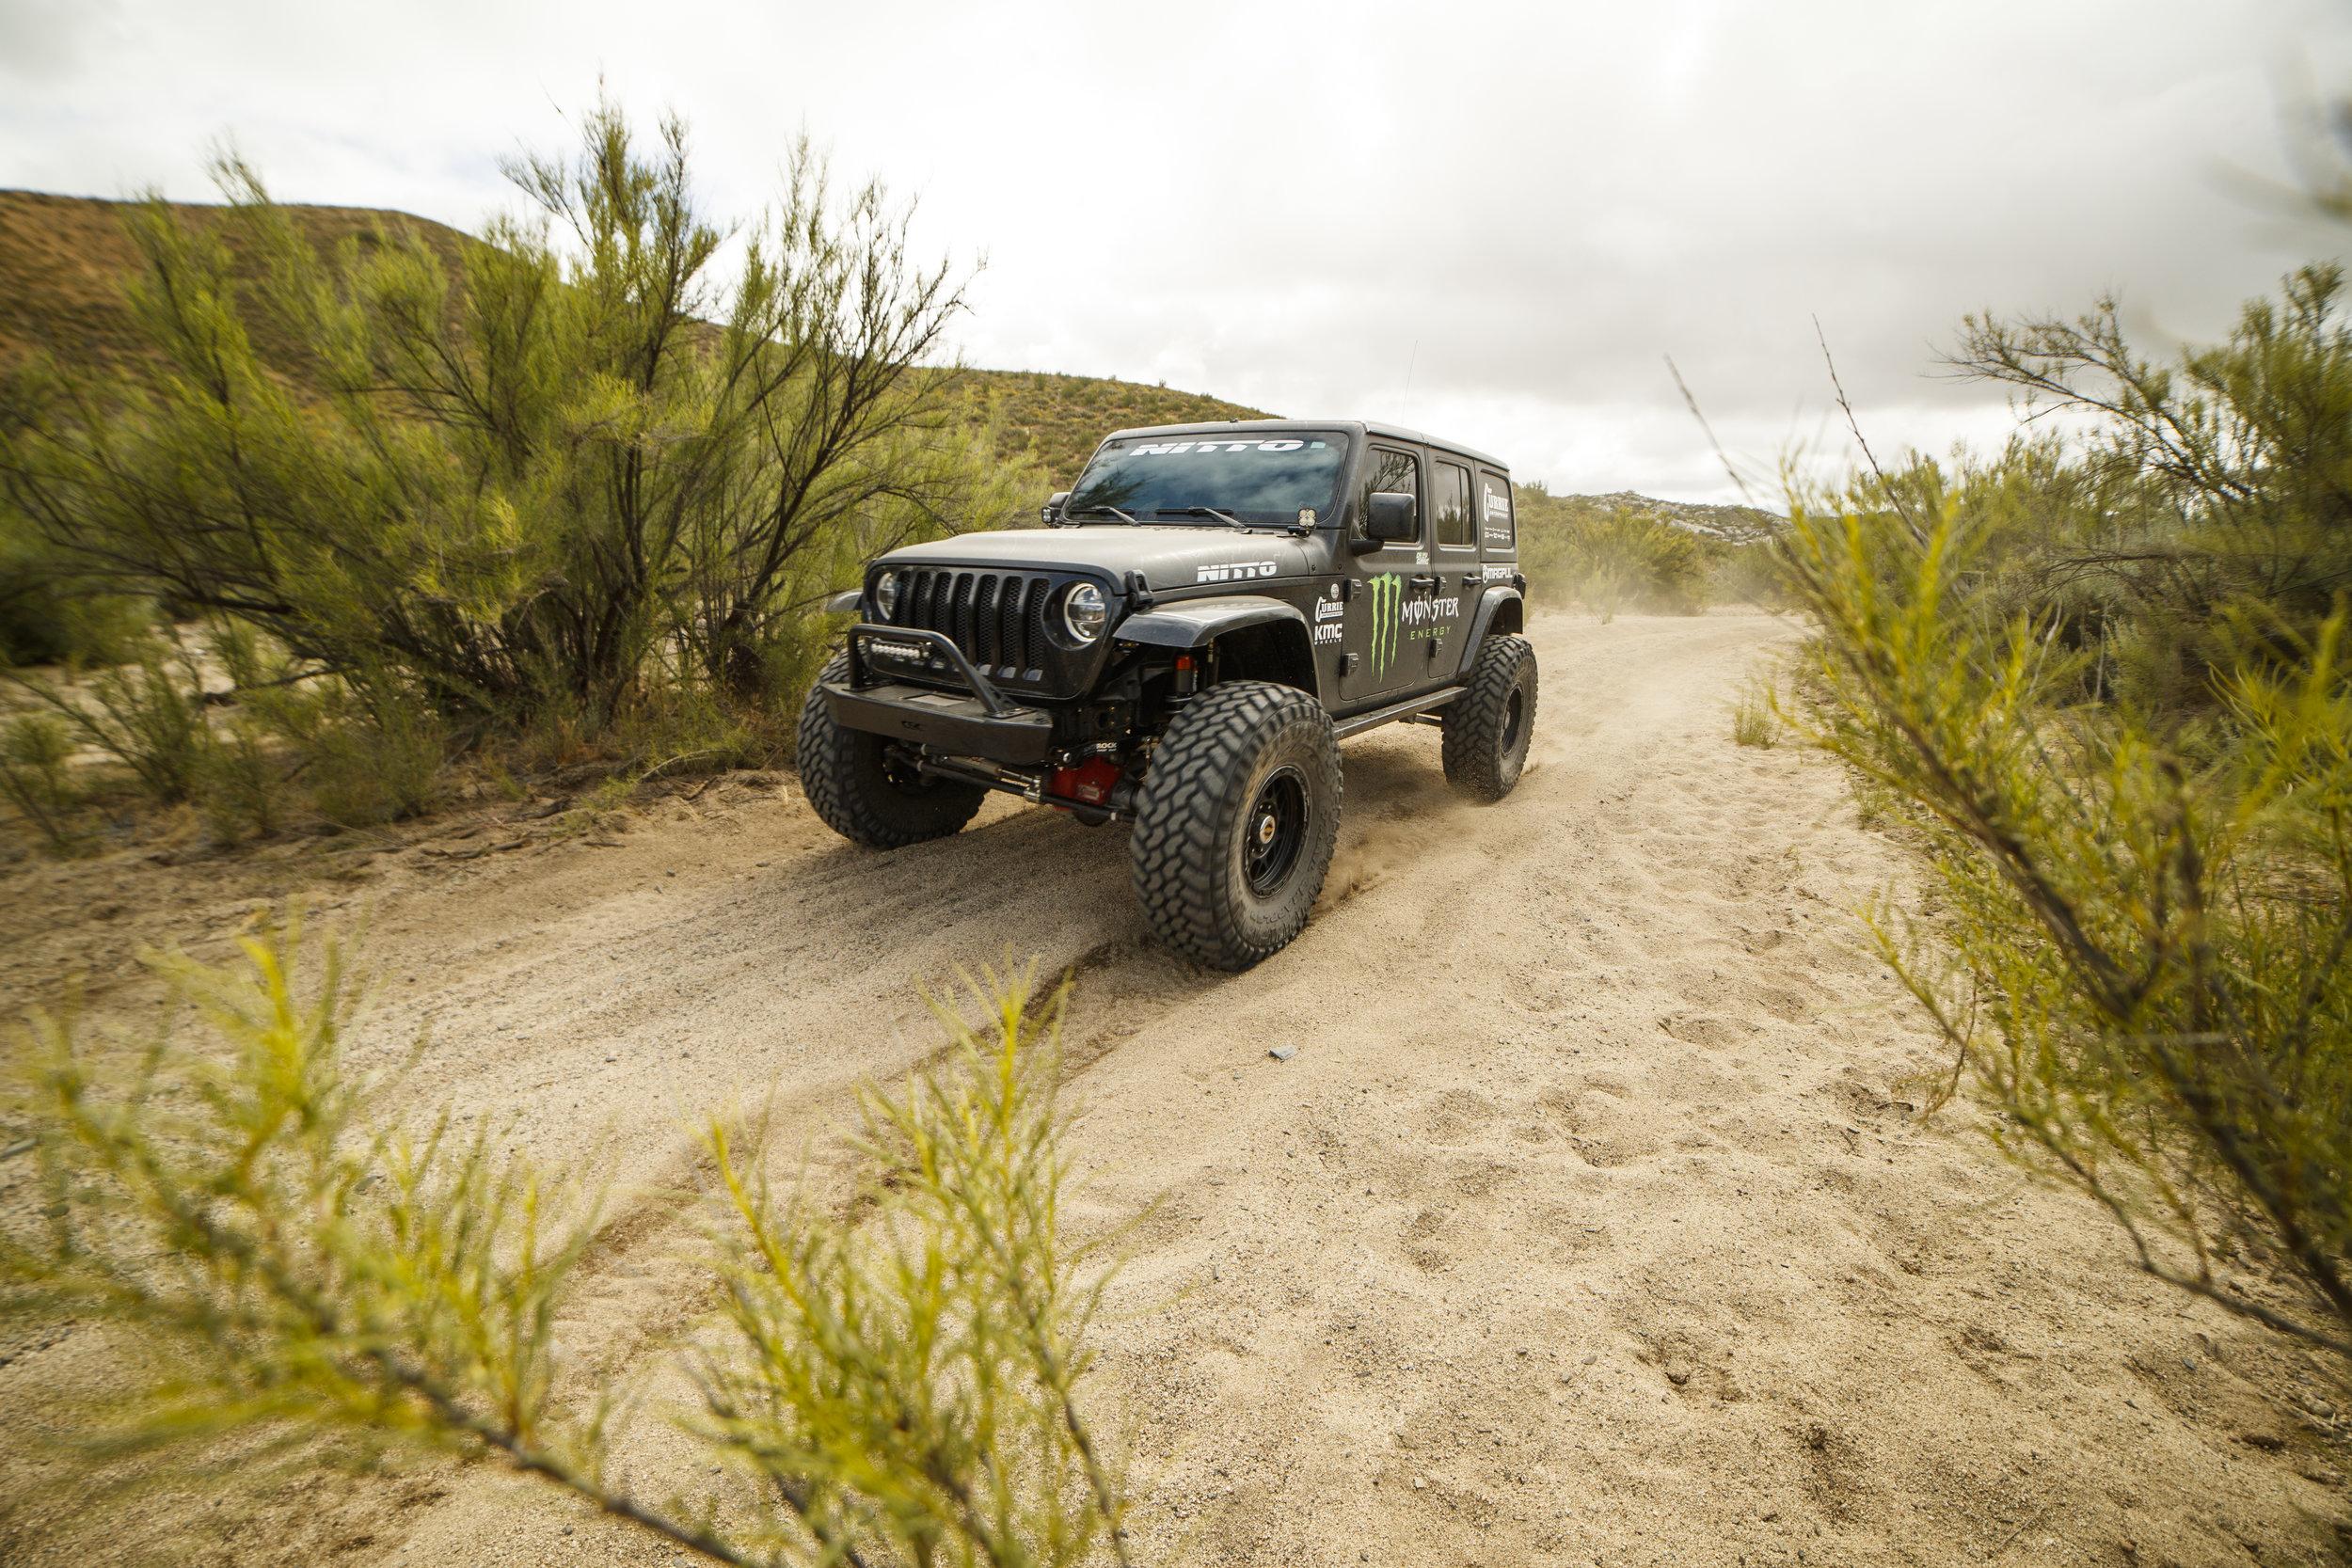 6_24_CaseyCurrie_Baja500PreRunning_BajaMexico_Jeep_013.jpg